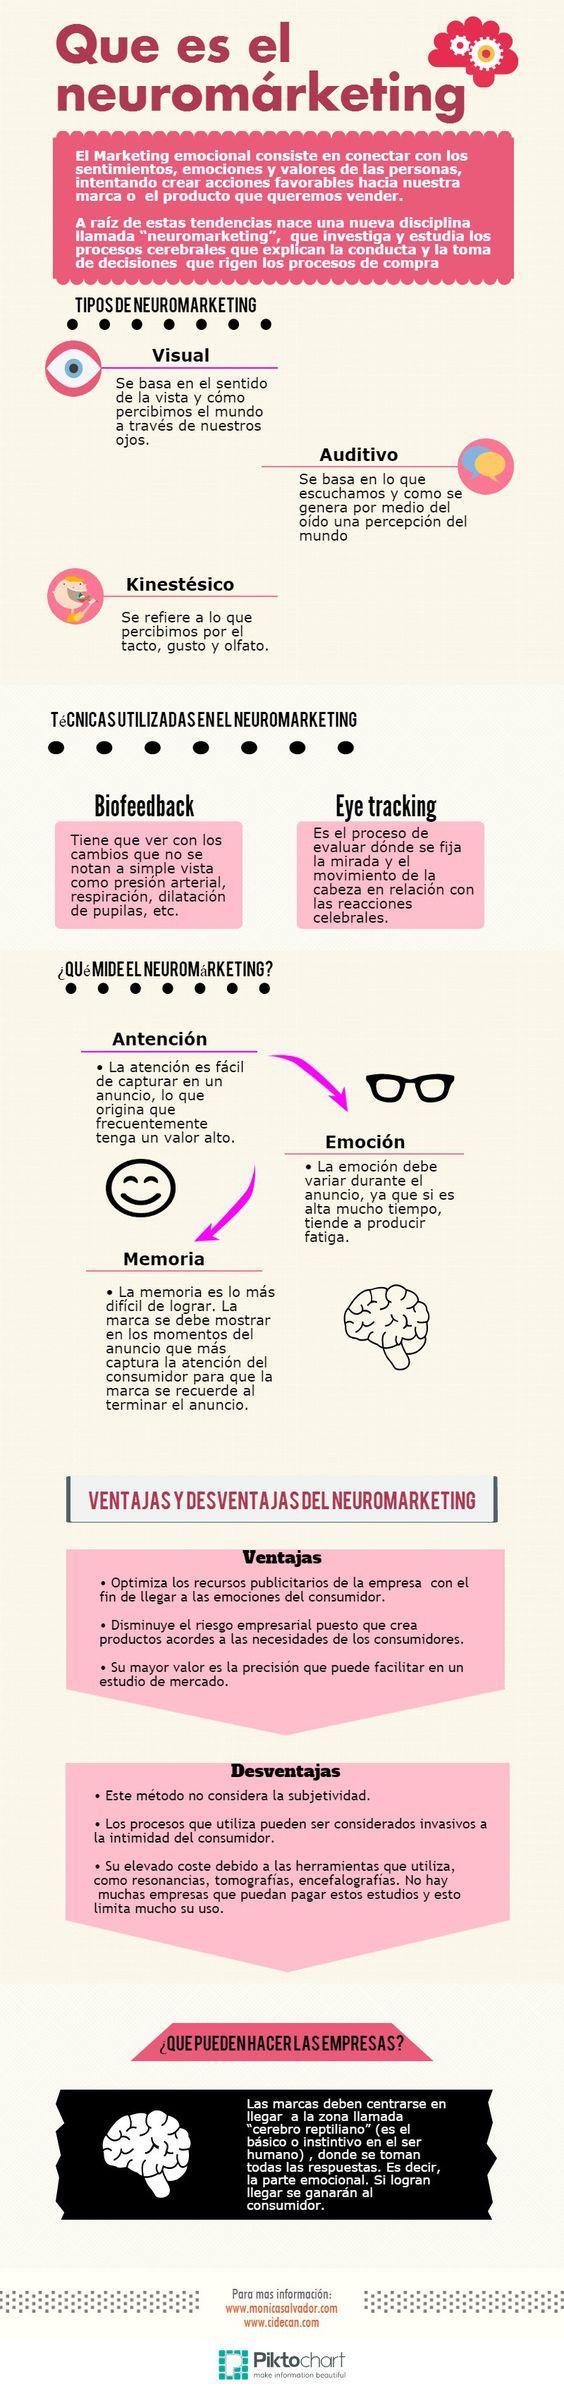 Cómo utilizar el #neuromarketing   www.neuromarketingytecnologia.com/blog